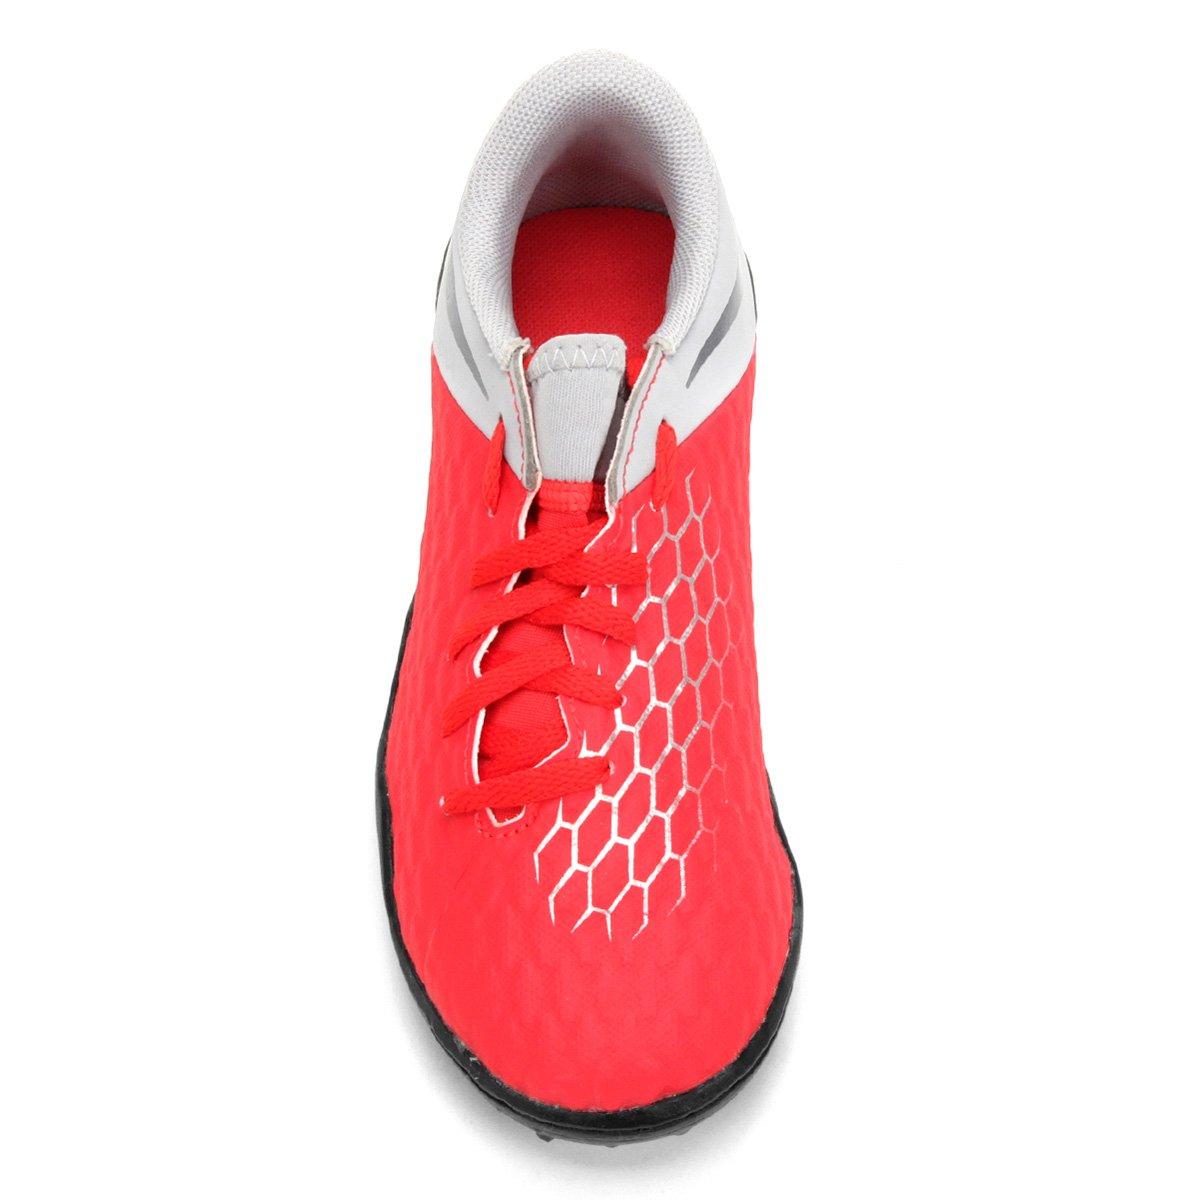 b6fc7bb12c Chuteira Society Infantil Nike Hypervenom 3 Academy TF - Vermelho e Cinza